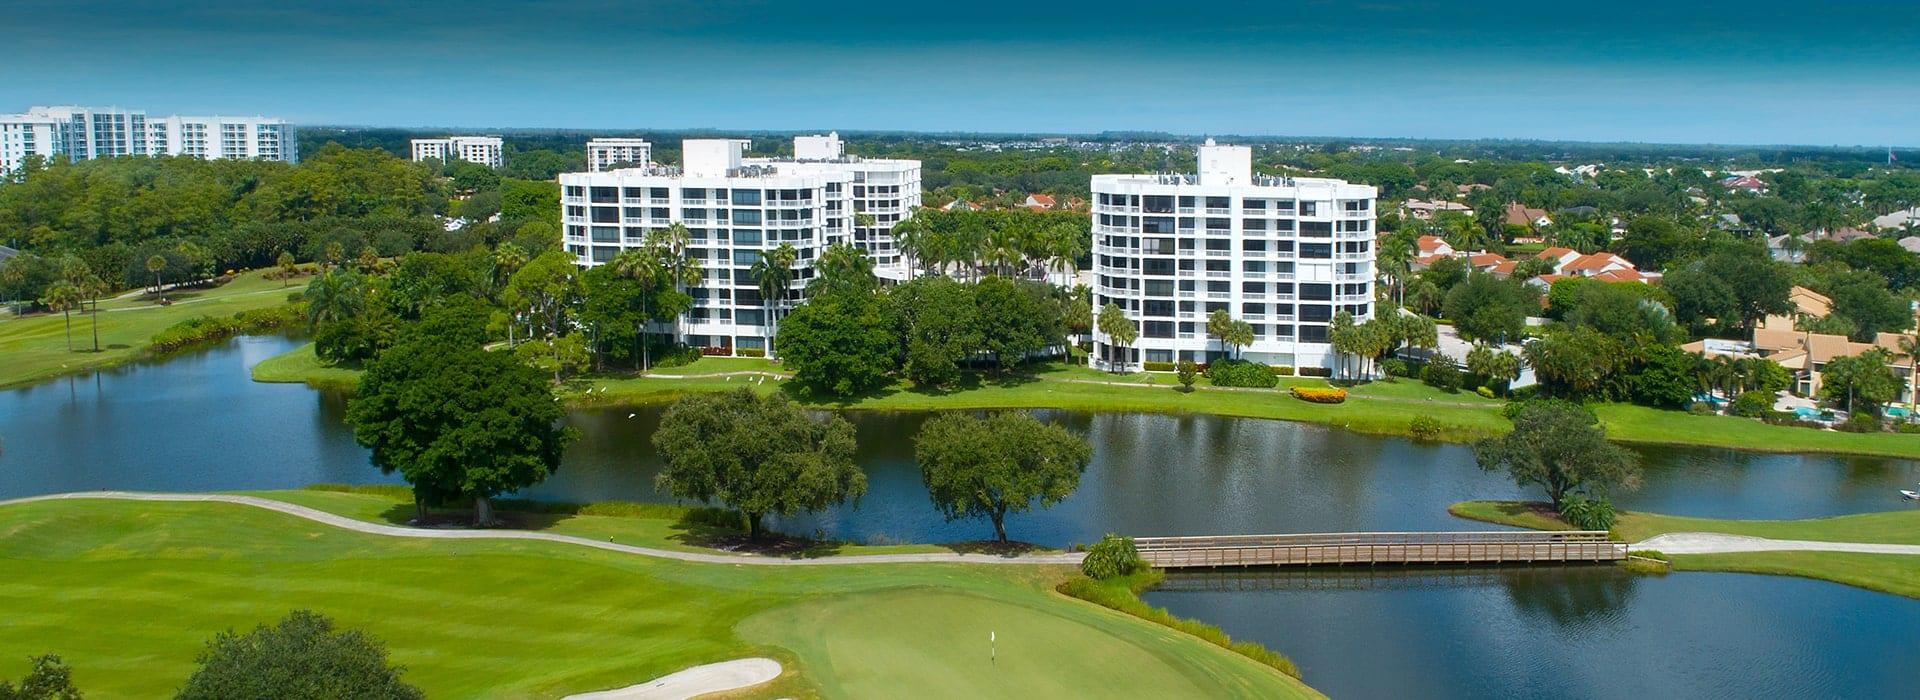 Fairway Point condominium living at Boca West overlooking fairways and greens